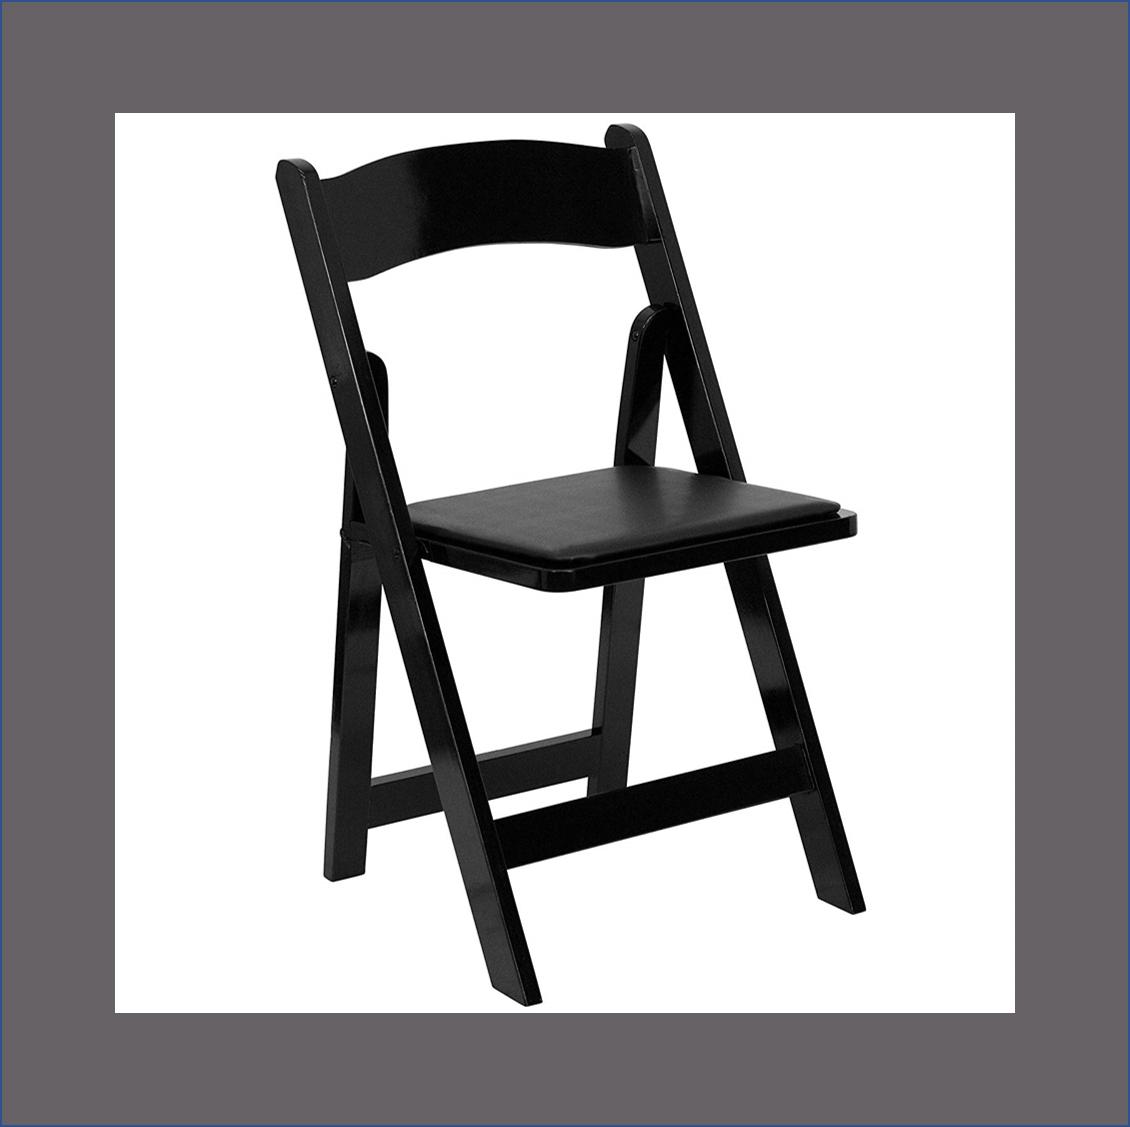 black-flip-up-chair